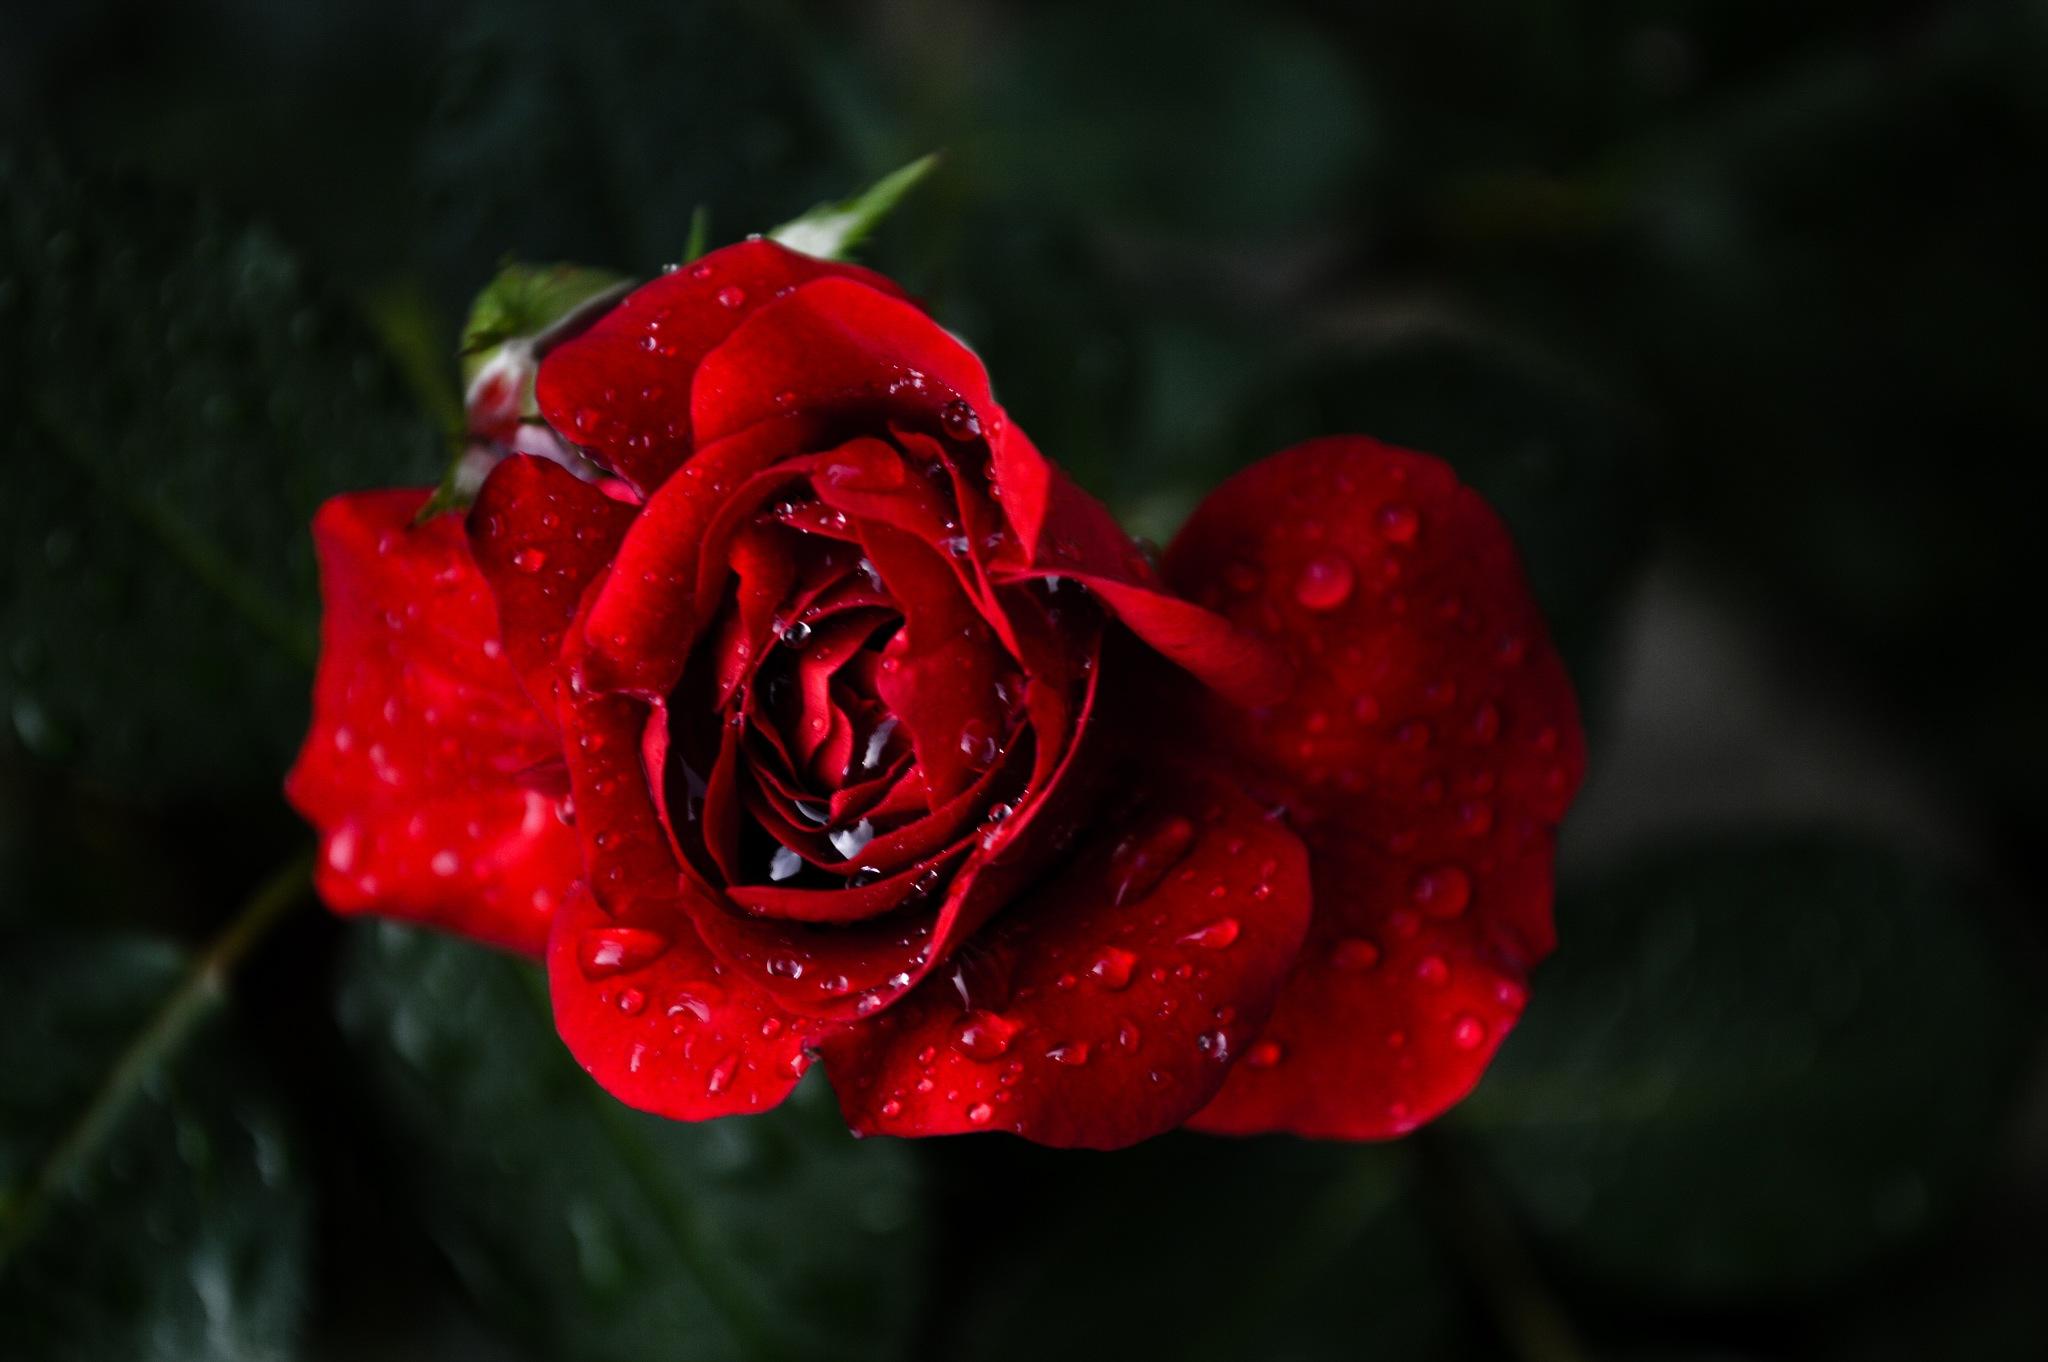 Red rose by Iulian Bud